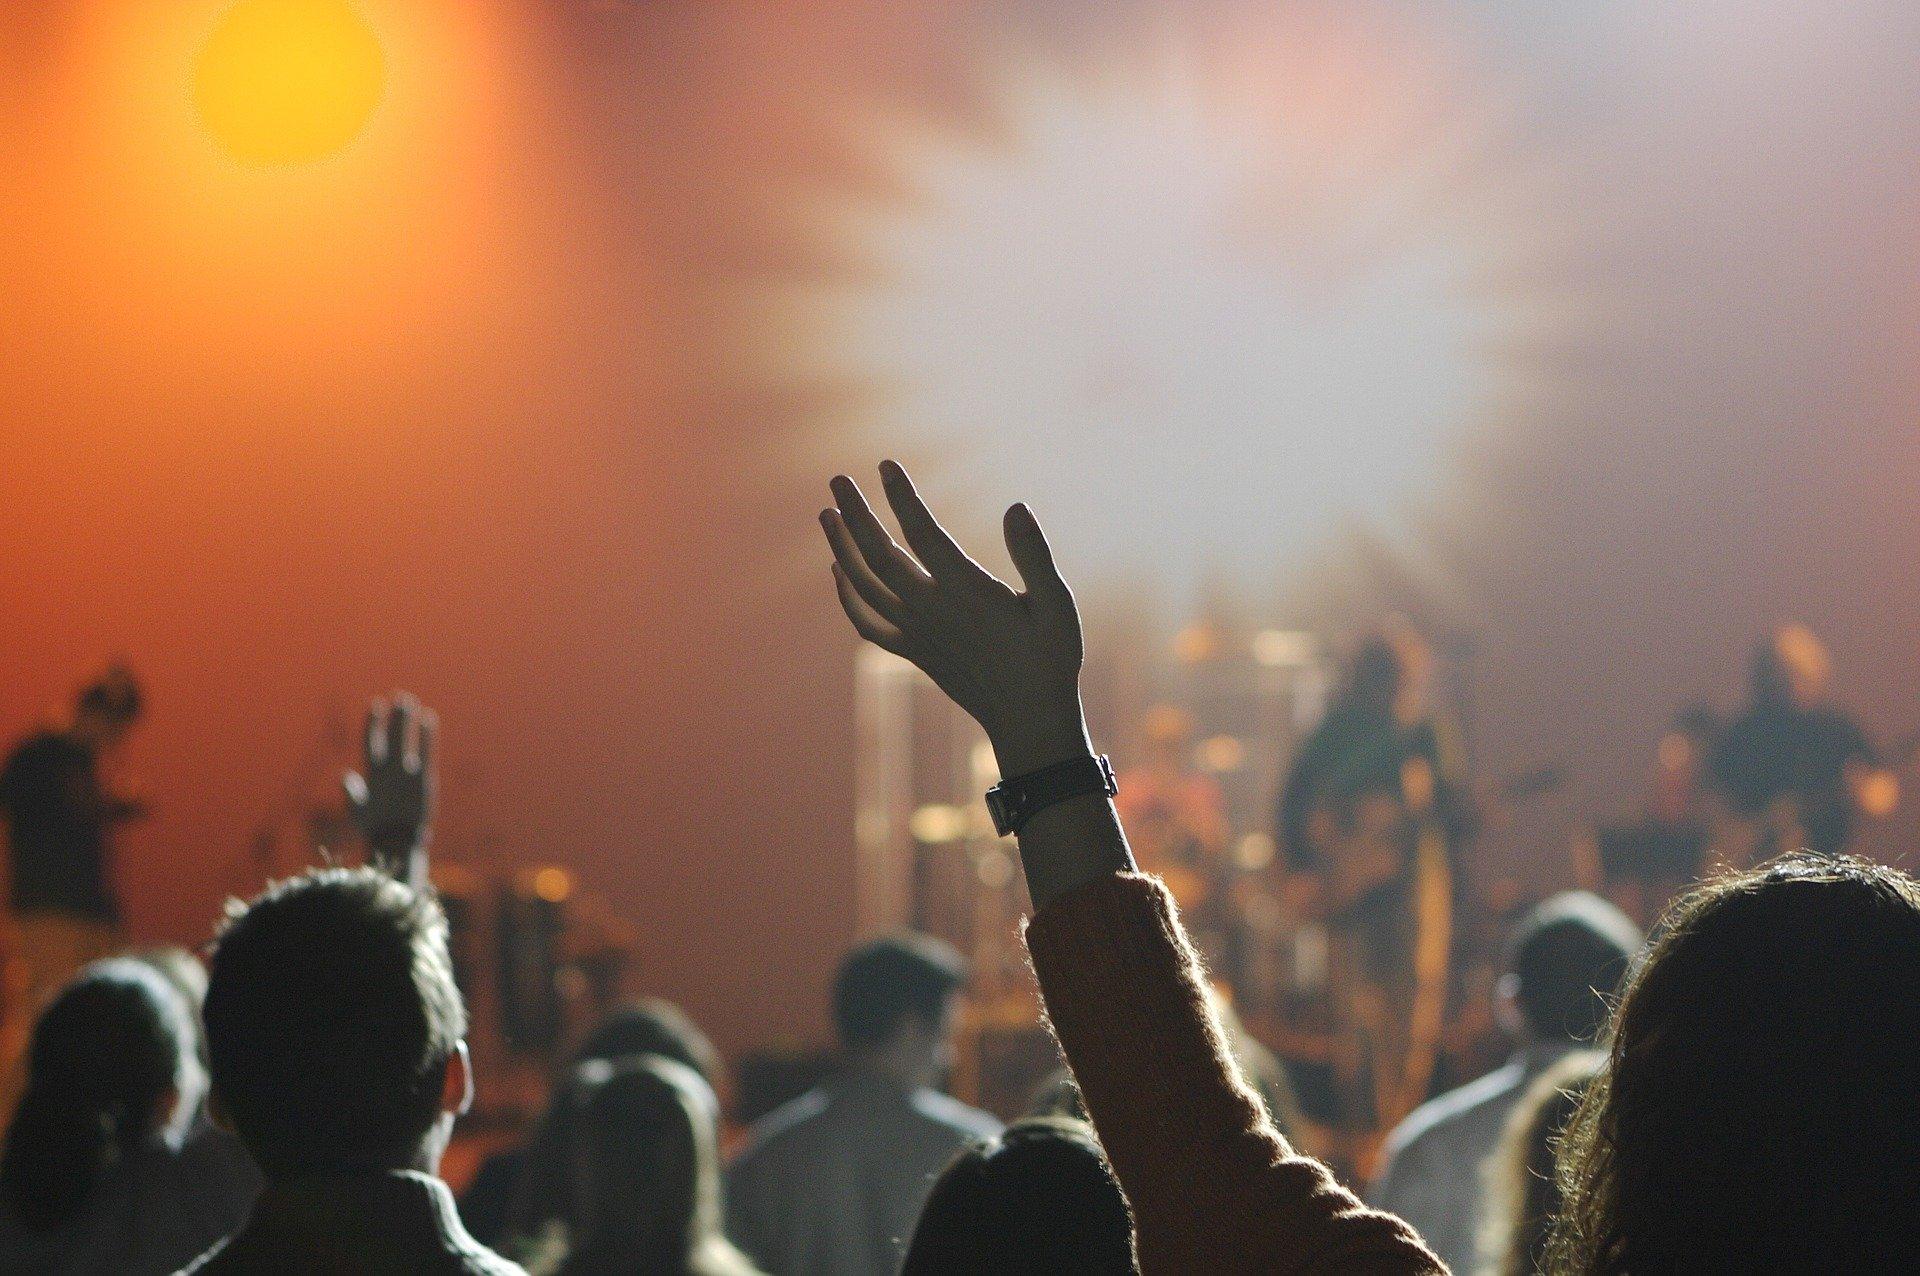 Concert Granollers